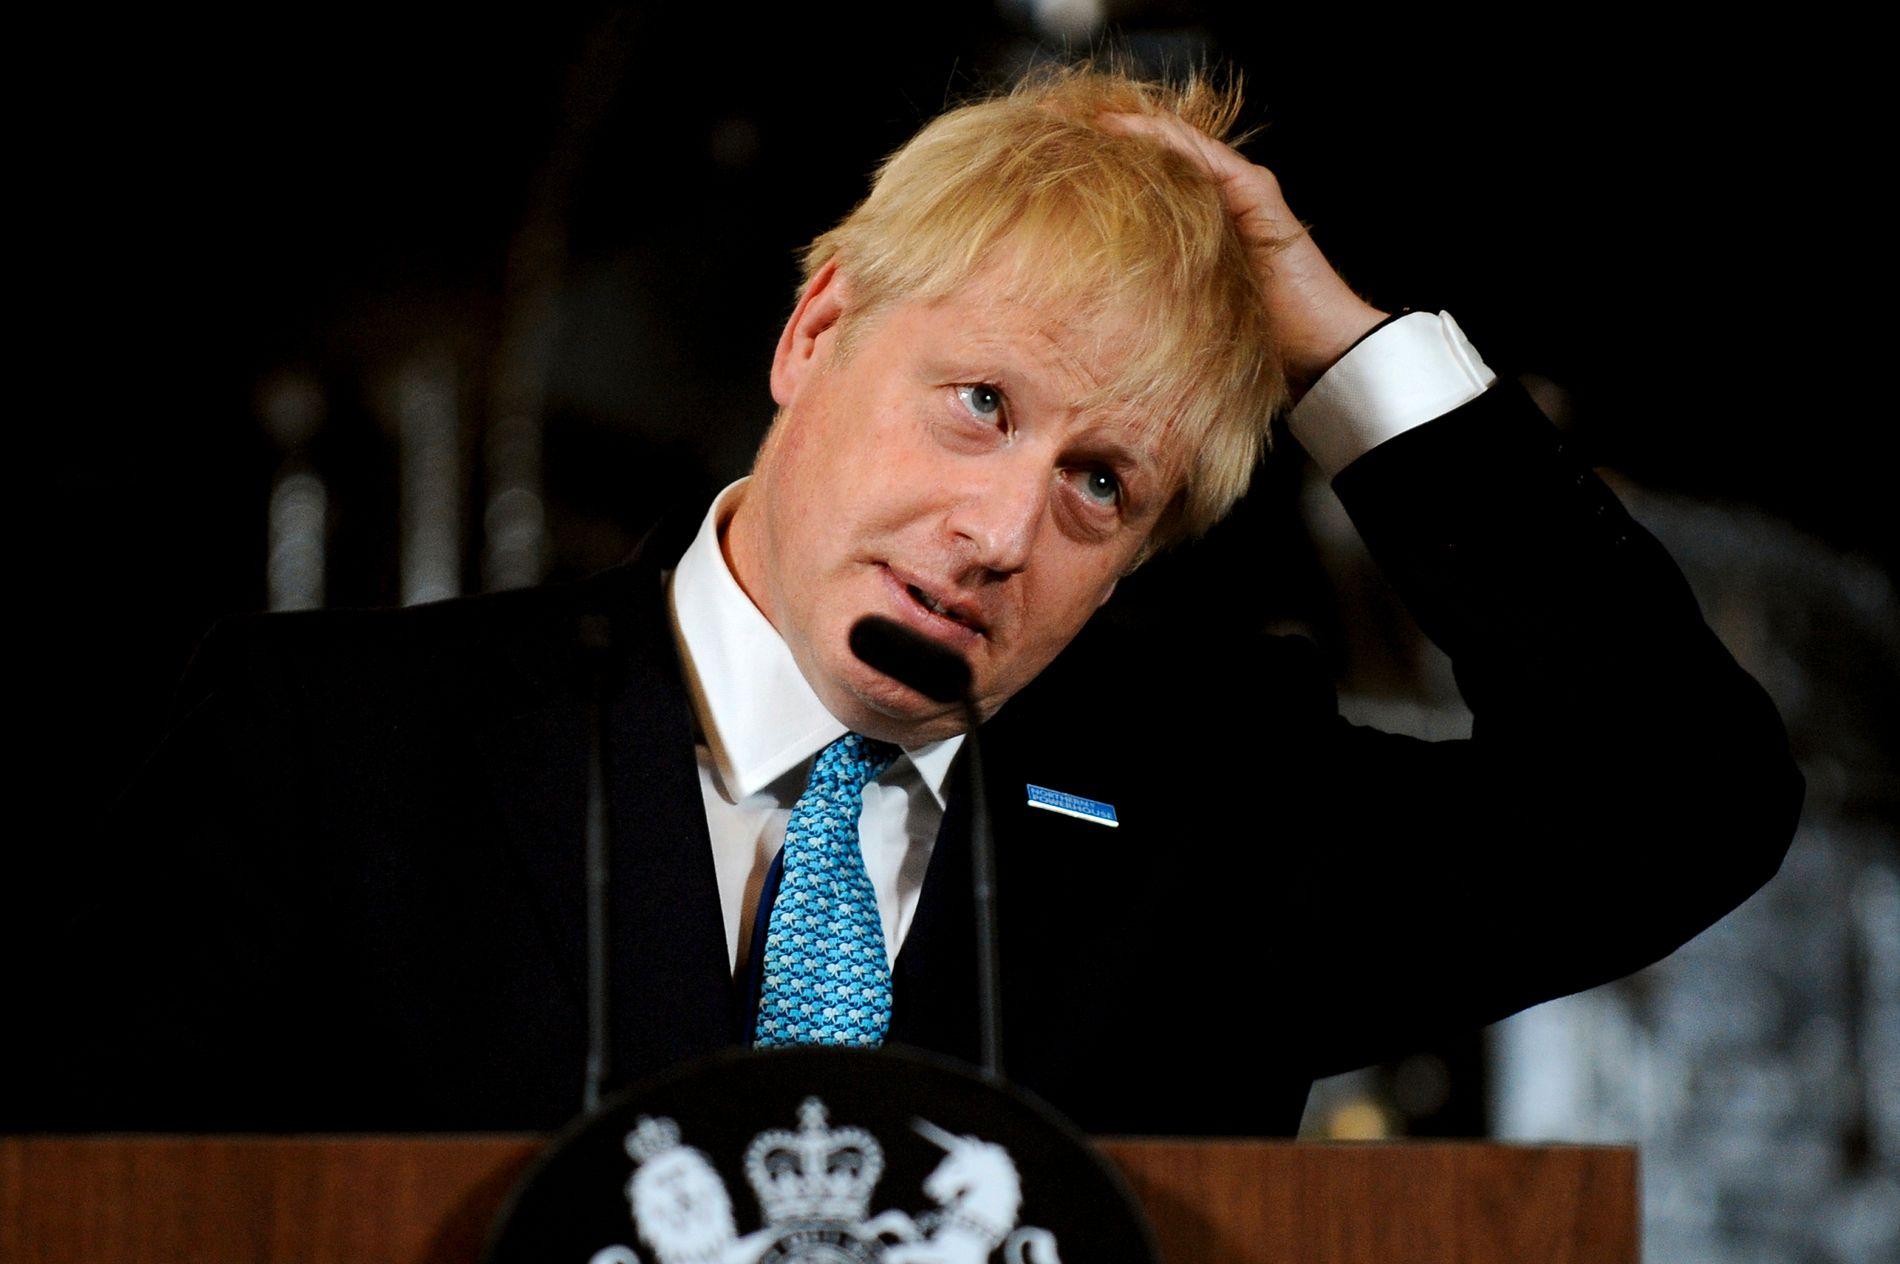 Storbritannias statsminister Boris Johnson under en tale i Manchester lørdag. Foto: Rui Vieira / AP / NTB scanpix